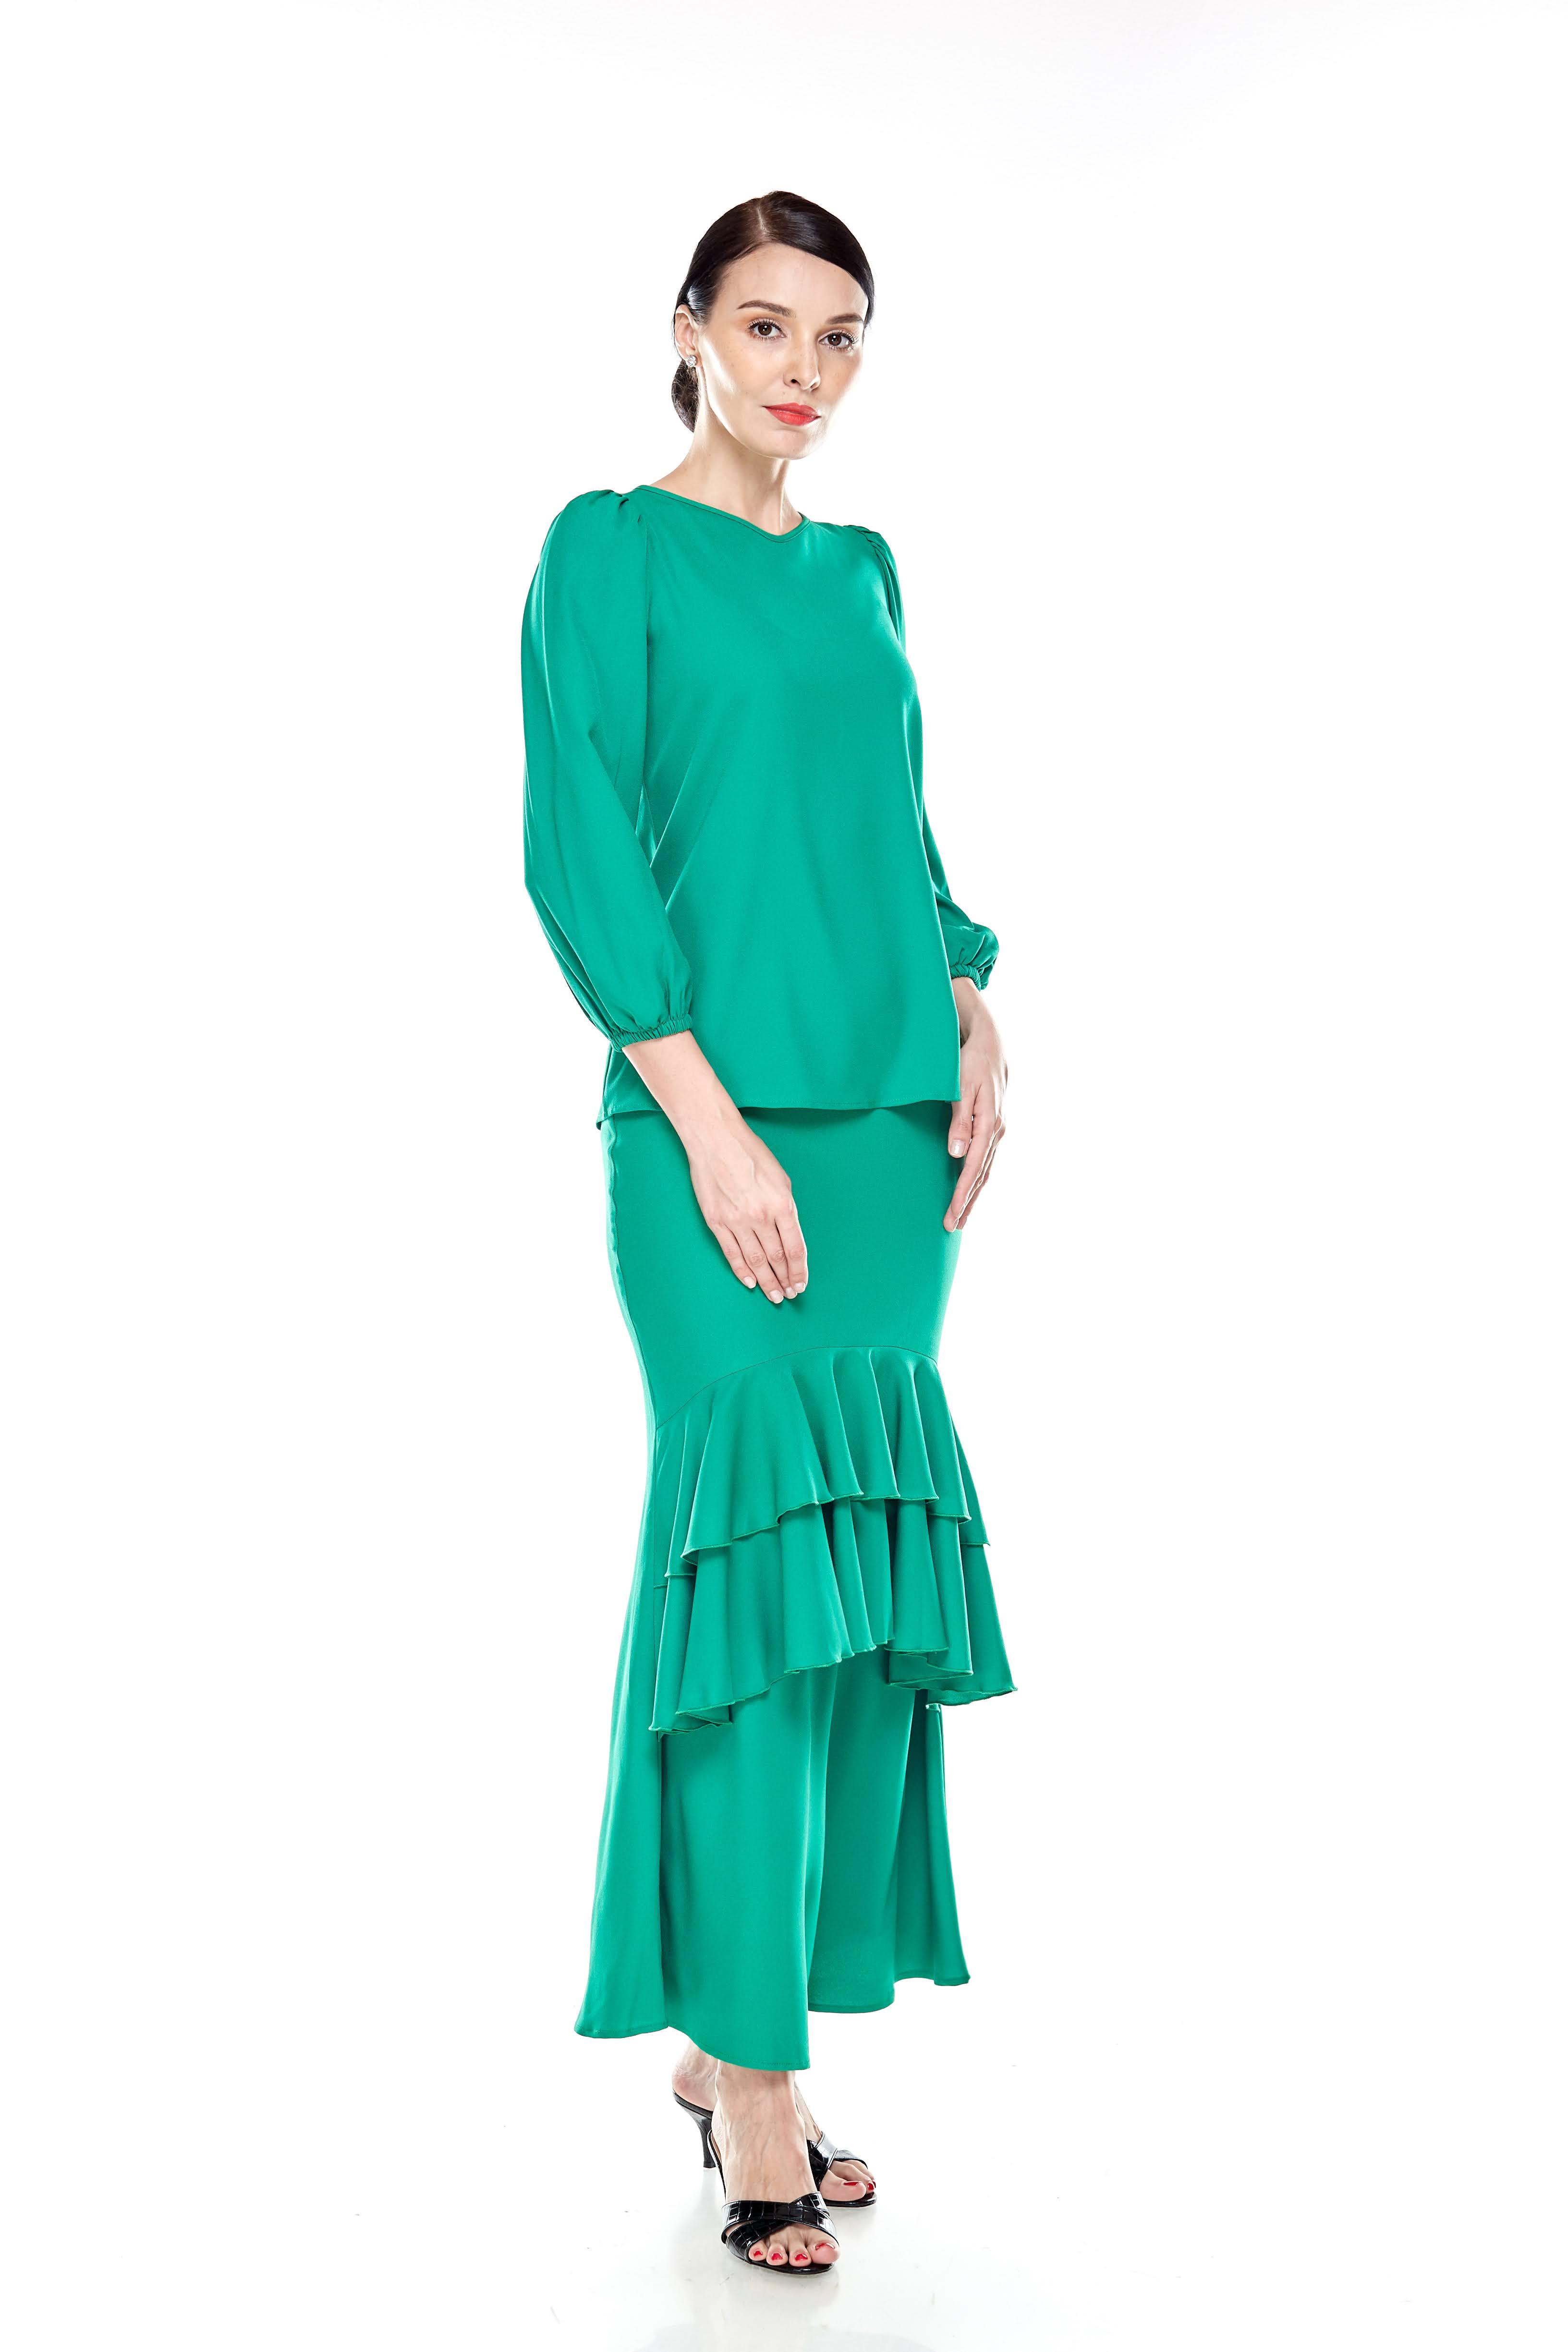 Shocking Green Puff Sleeve Blouse (2)